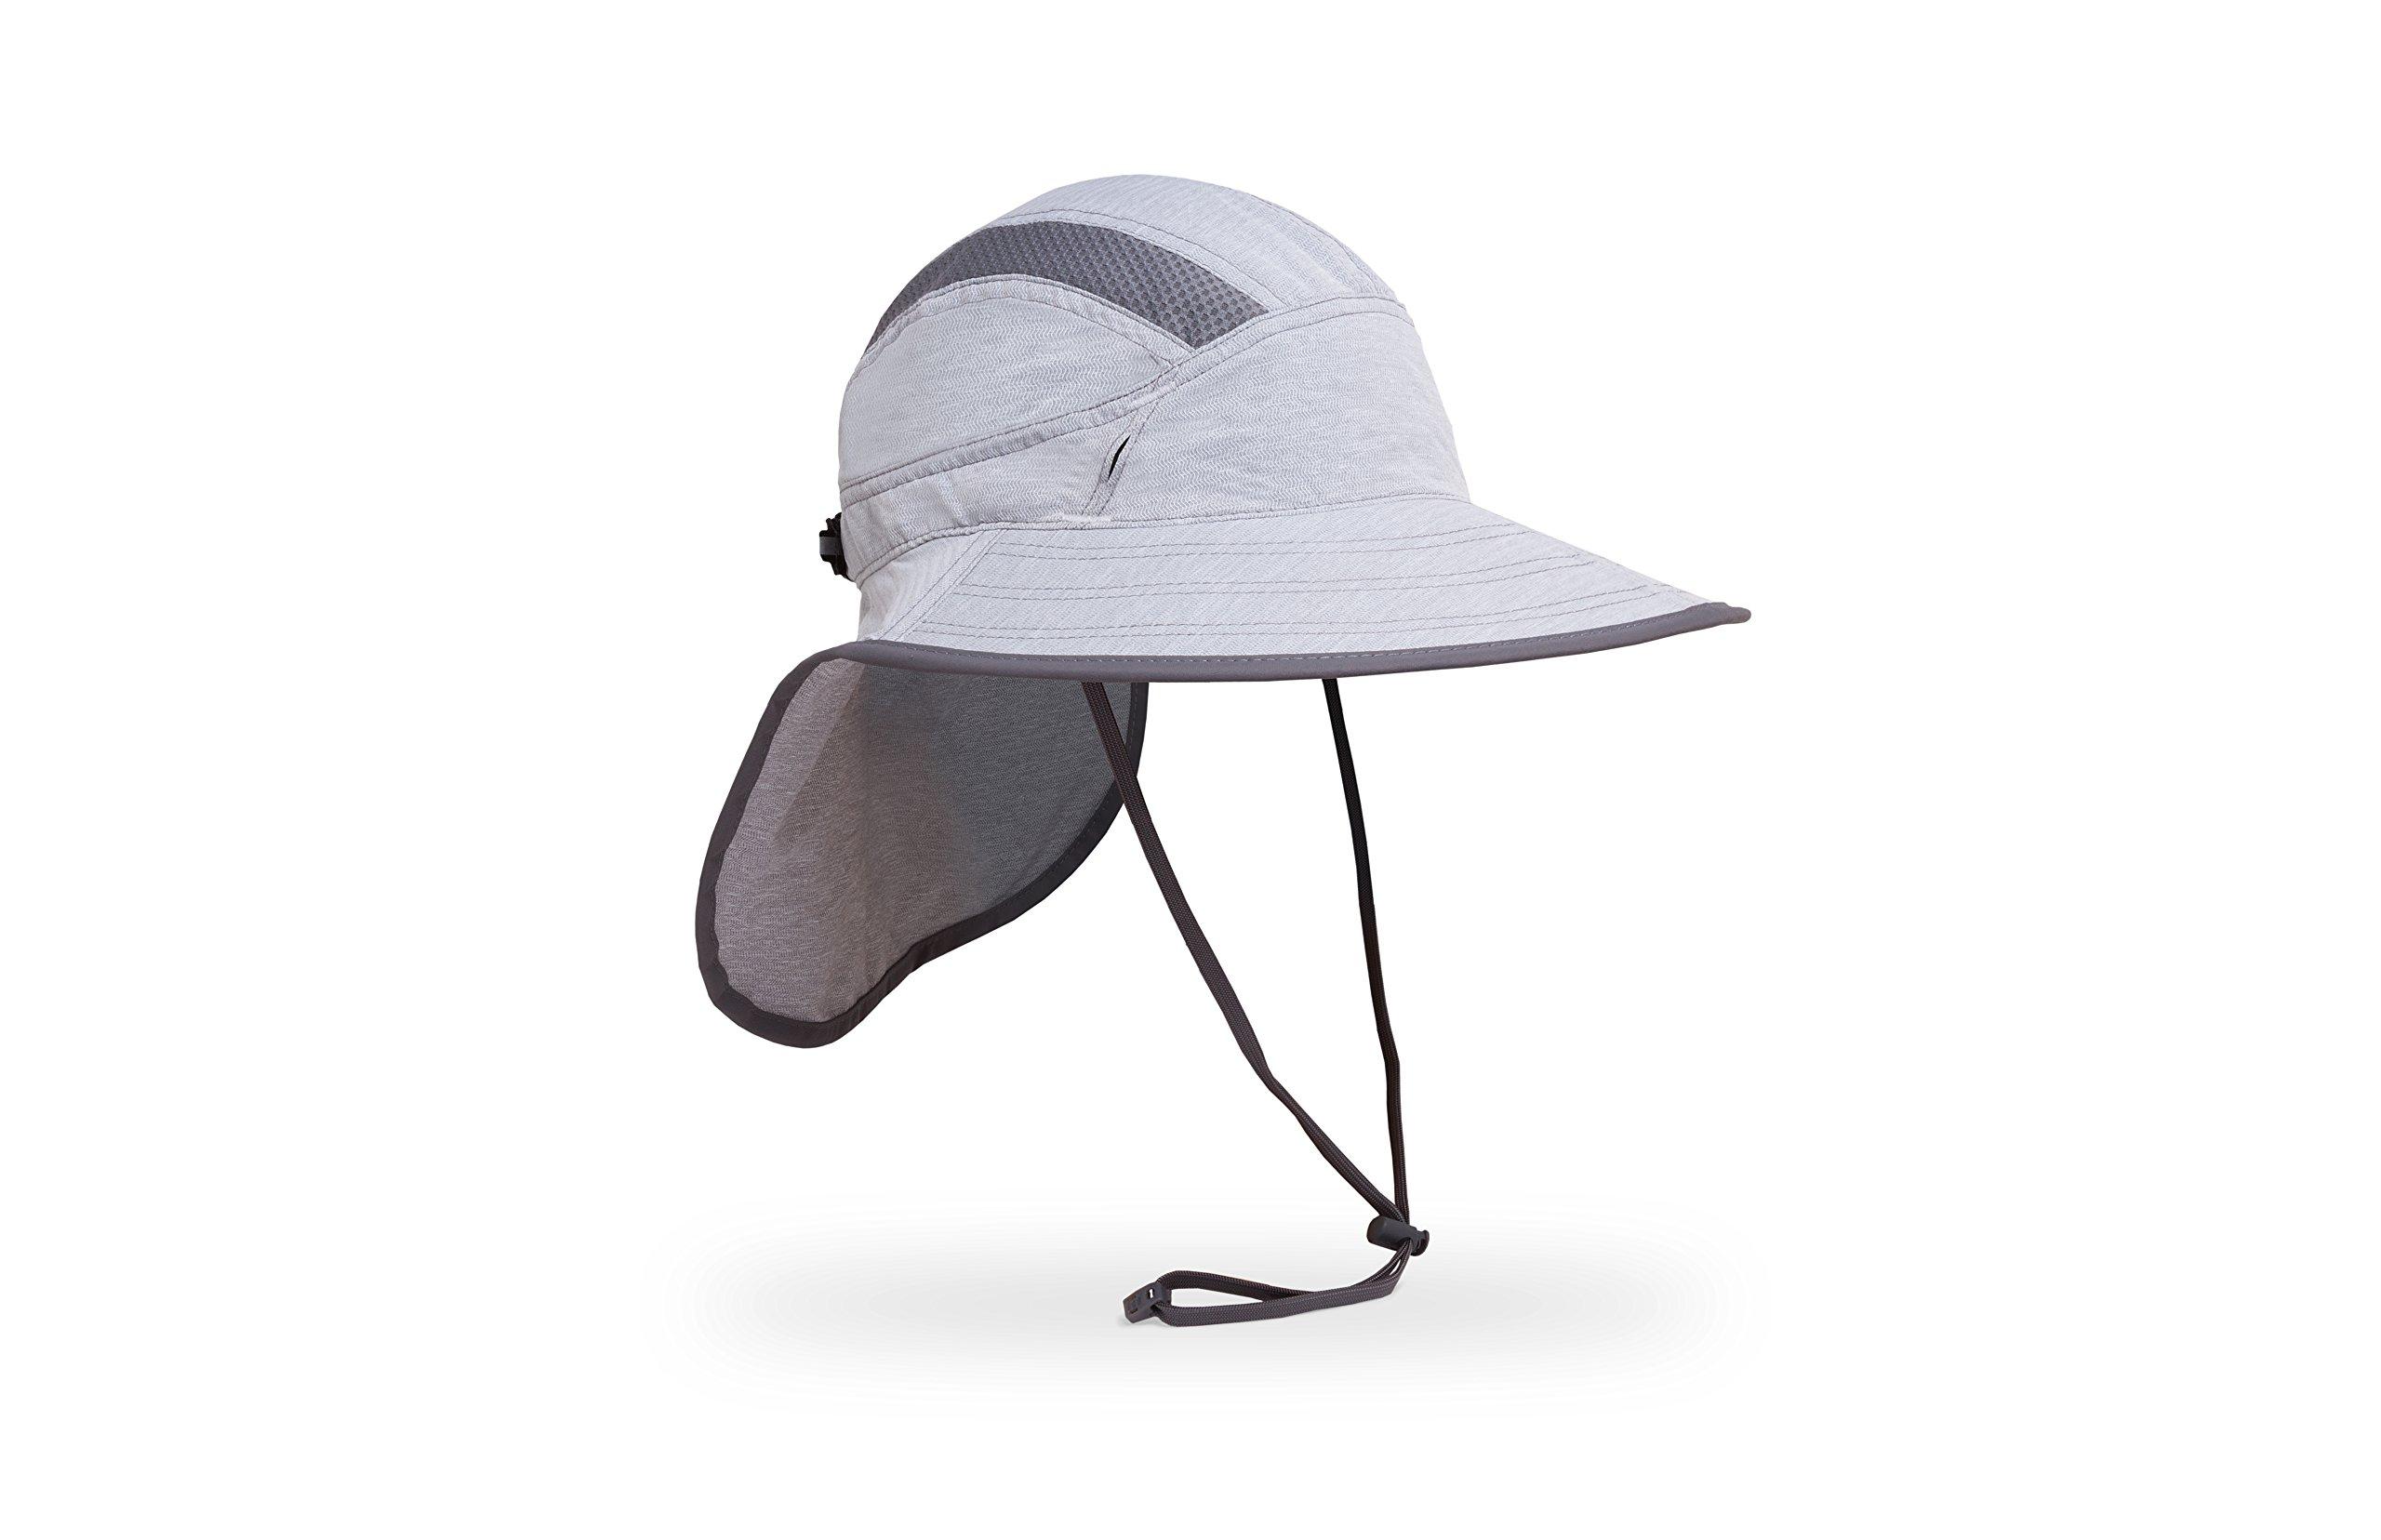 Sunday Afternoons Unisex Ultra-Adventure Hat, Pumice, Medium